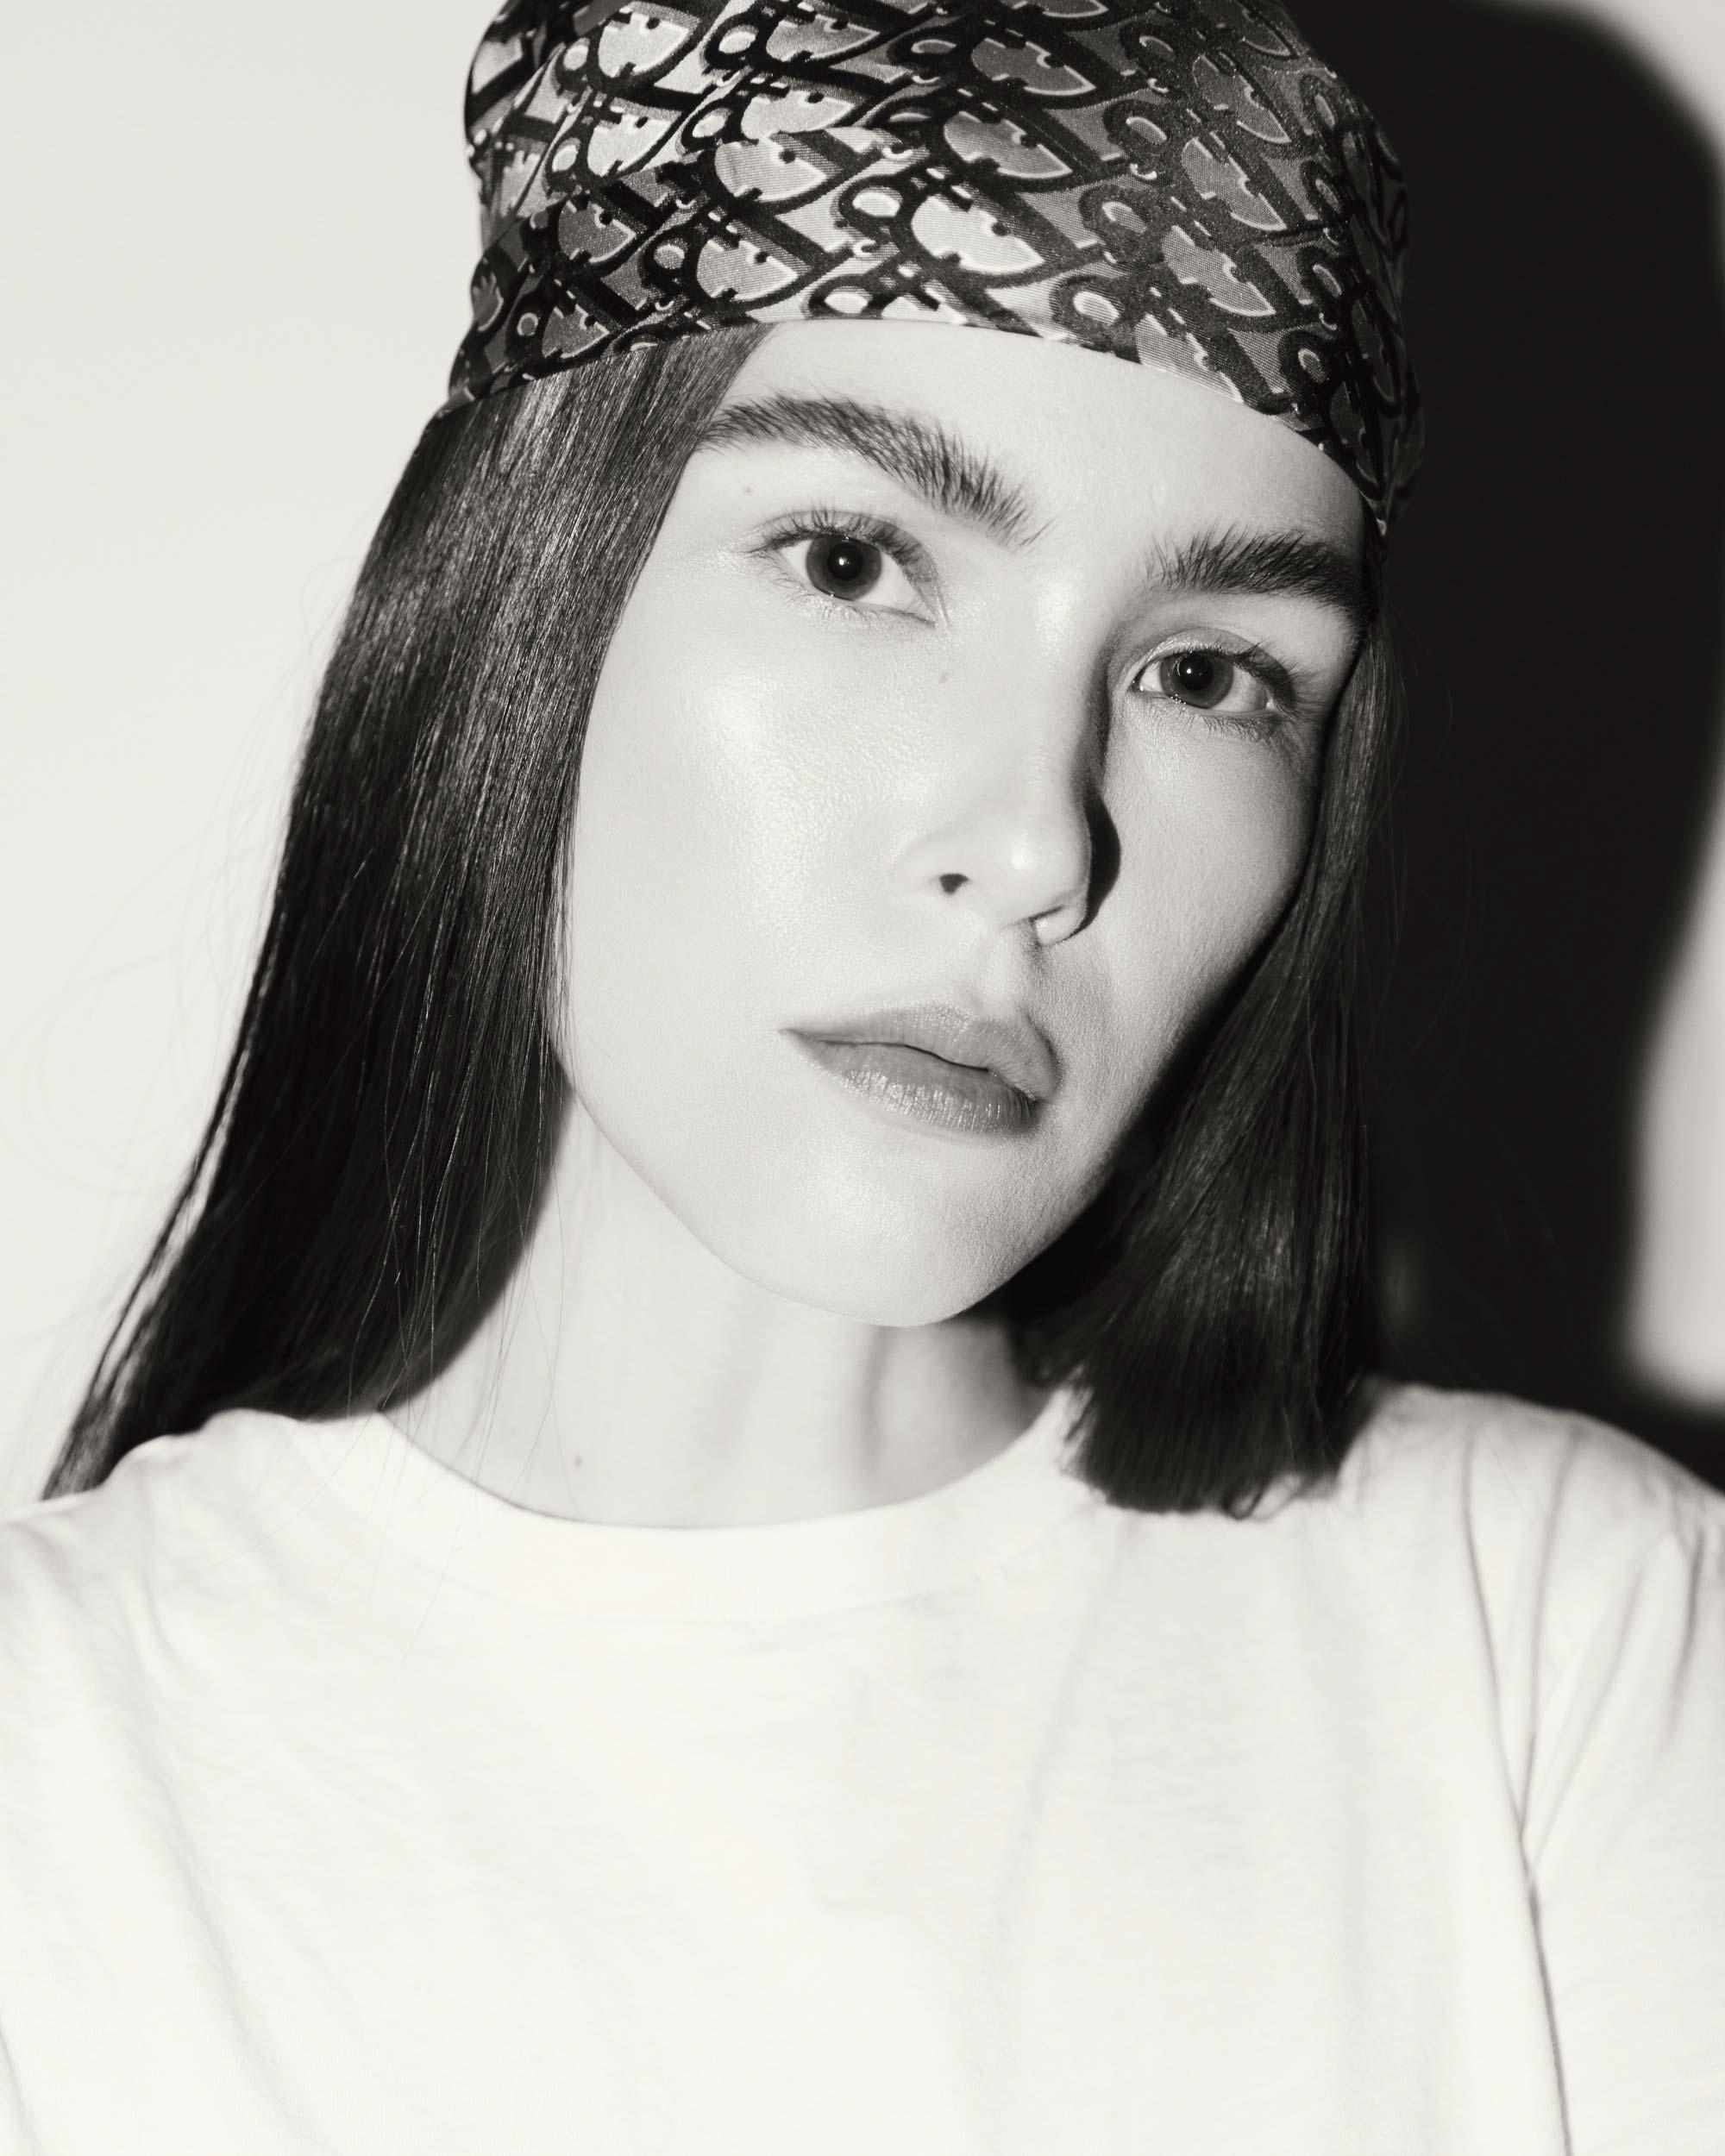 lena-herrmann-dior-scarf-01